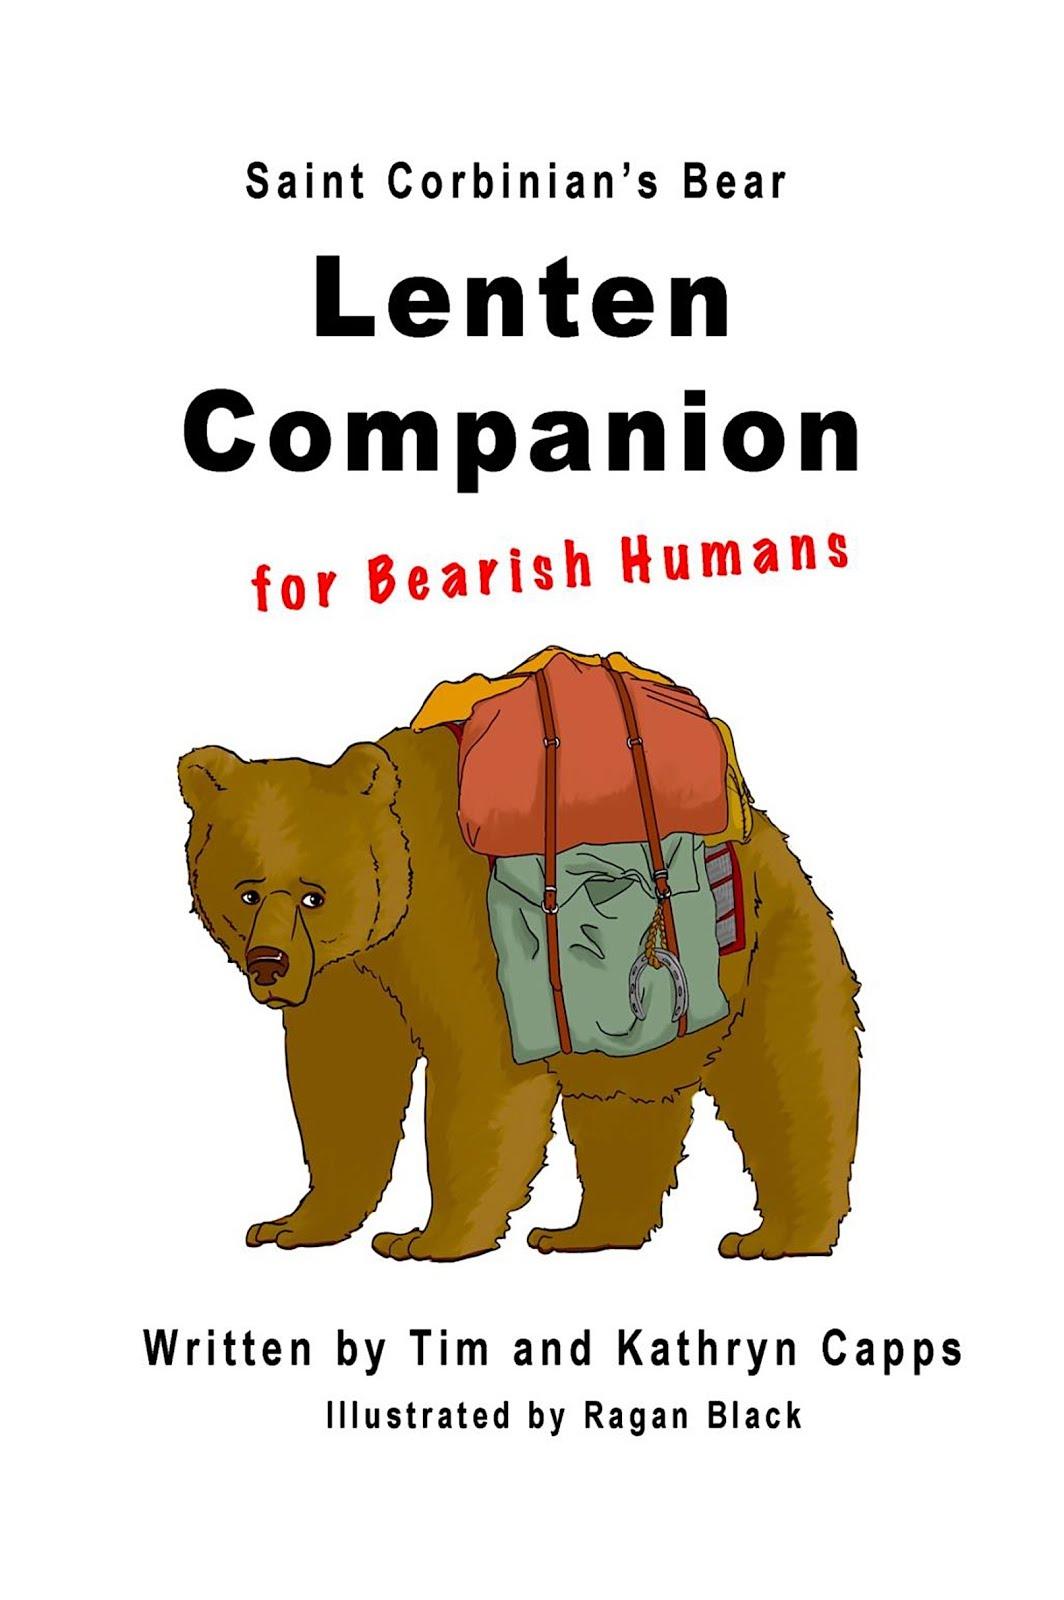 SAINT CORBINIAN'S BEAR LENTEN COMPANION FOR BEARISH HUMANS